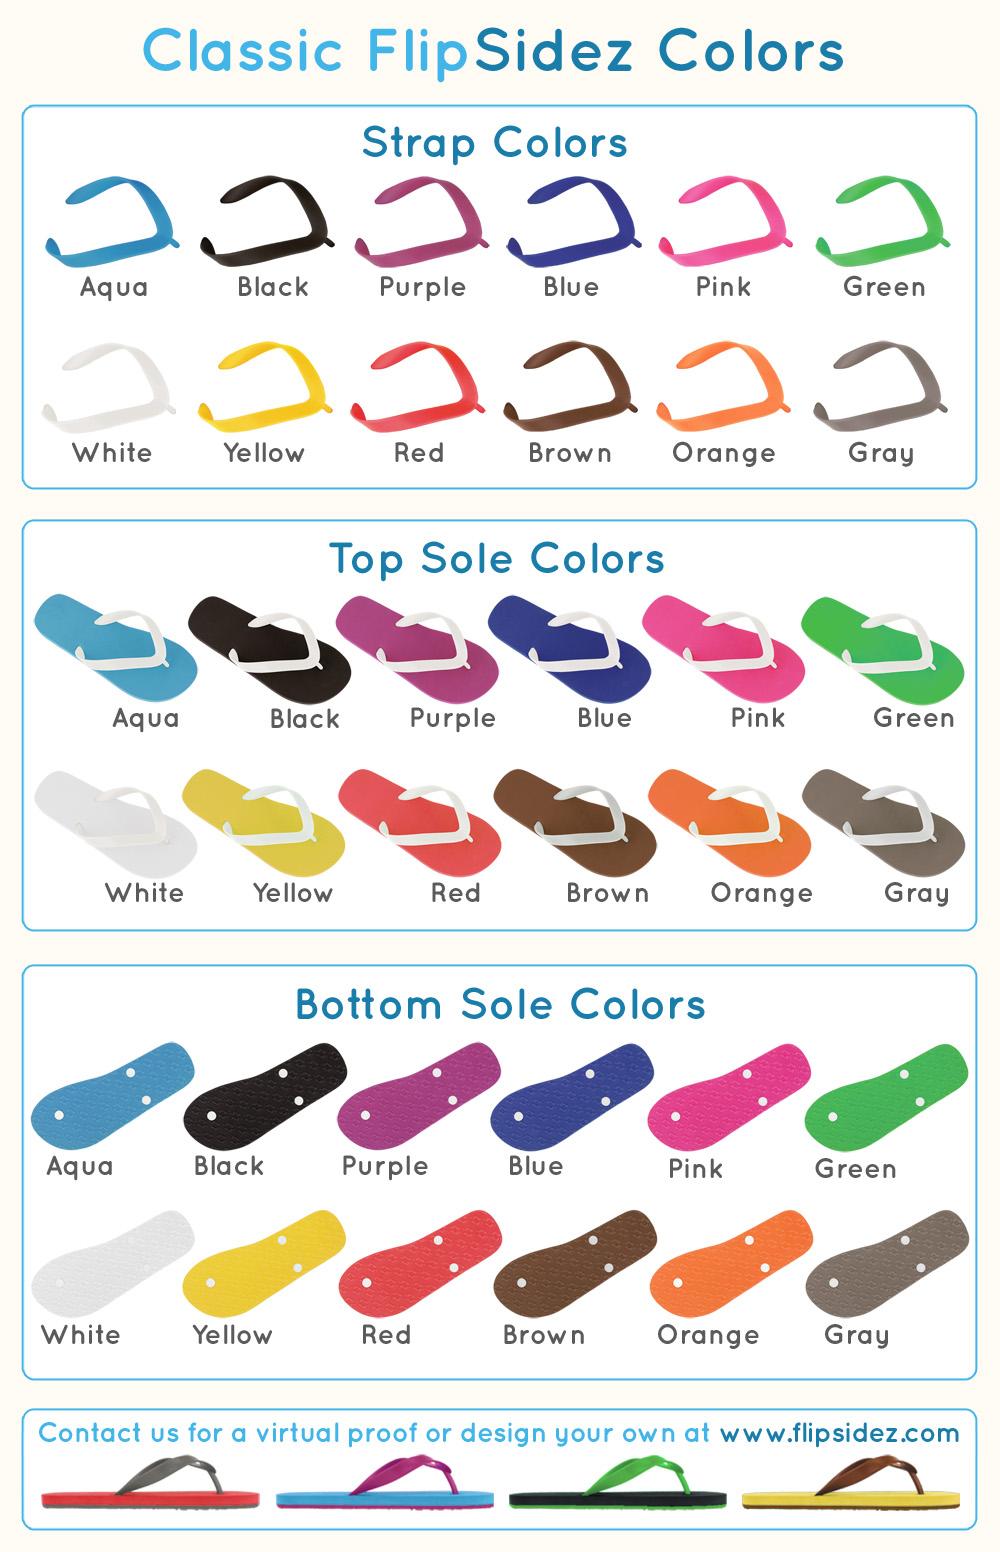 Classic FlipSidez Full Color Chart3 small